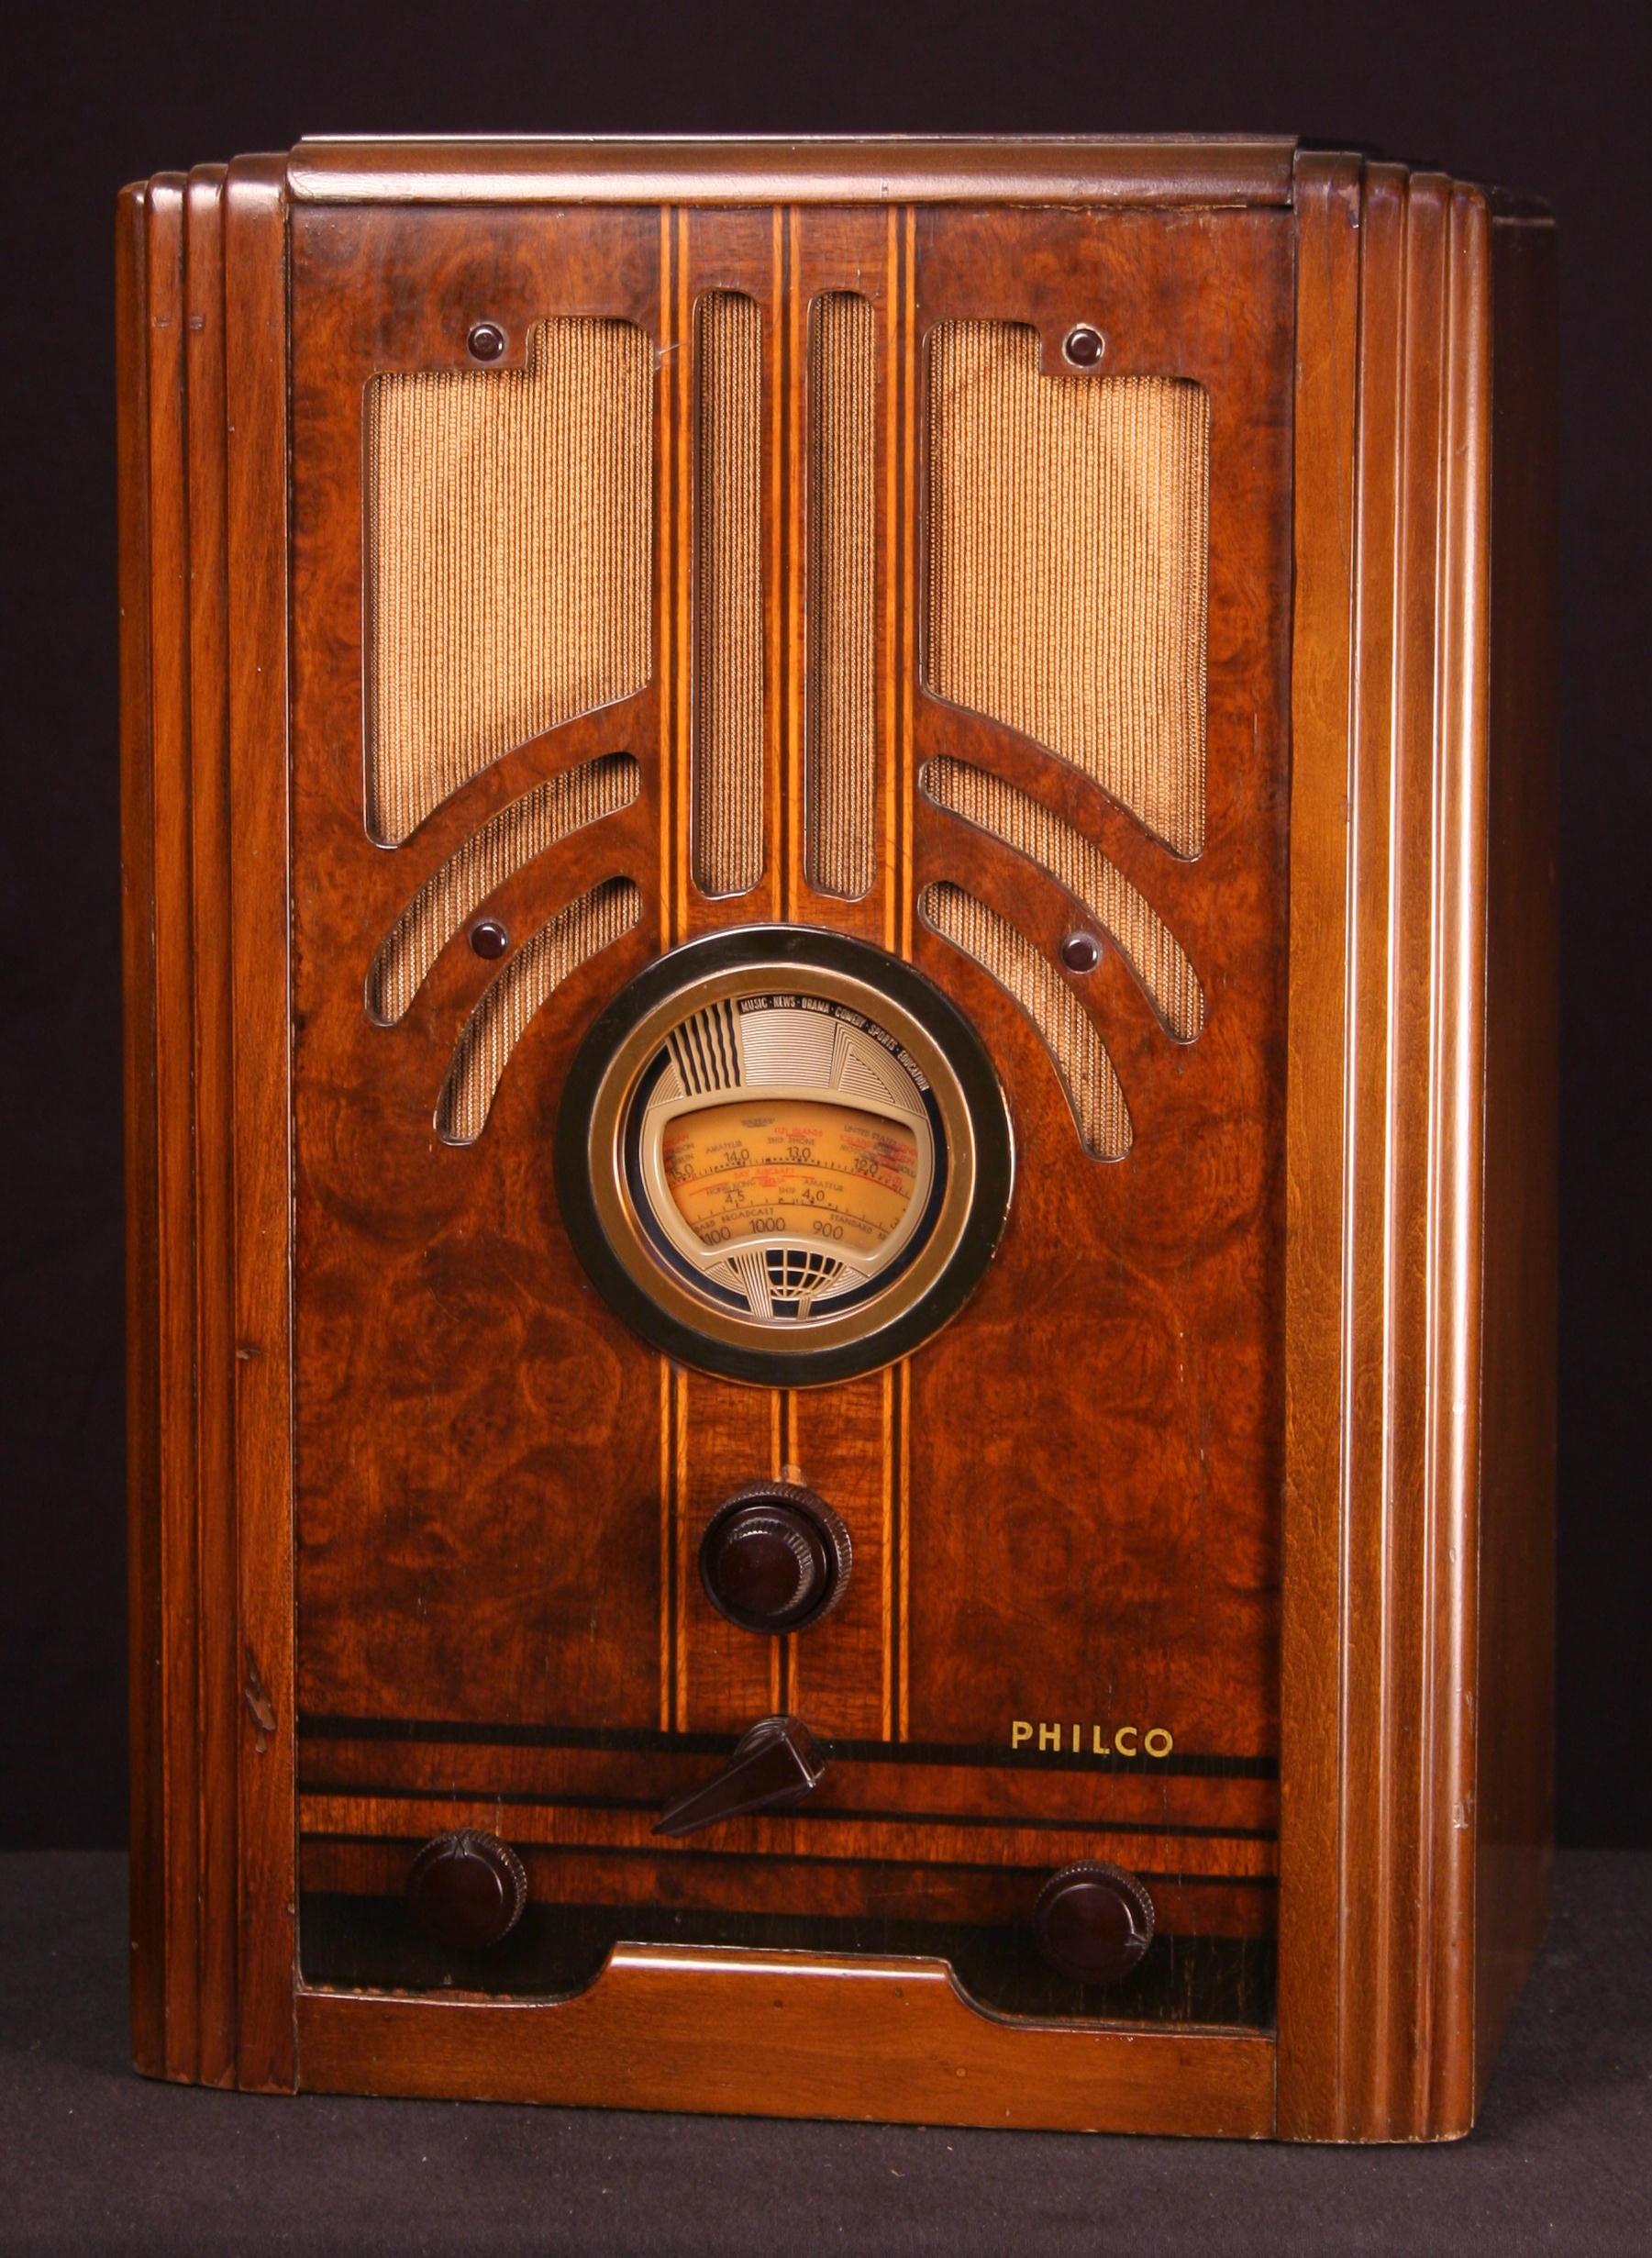 Philco Model 37610B Tombstone Radio Jan 1937